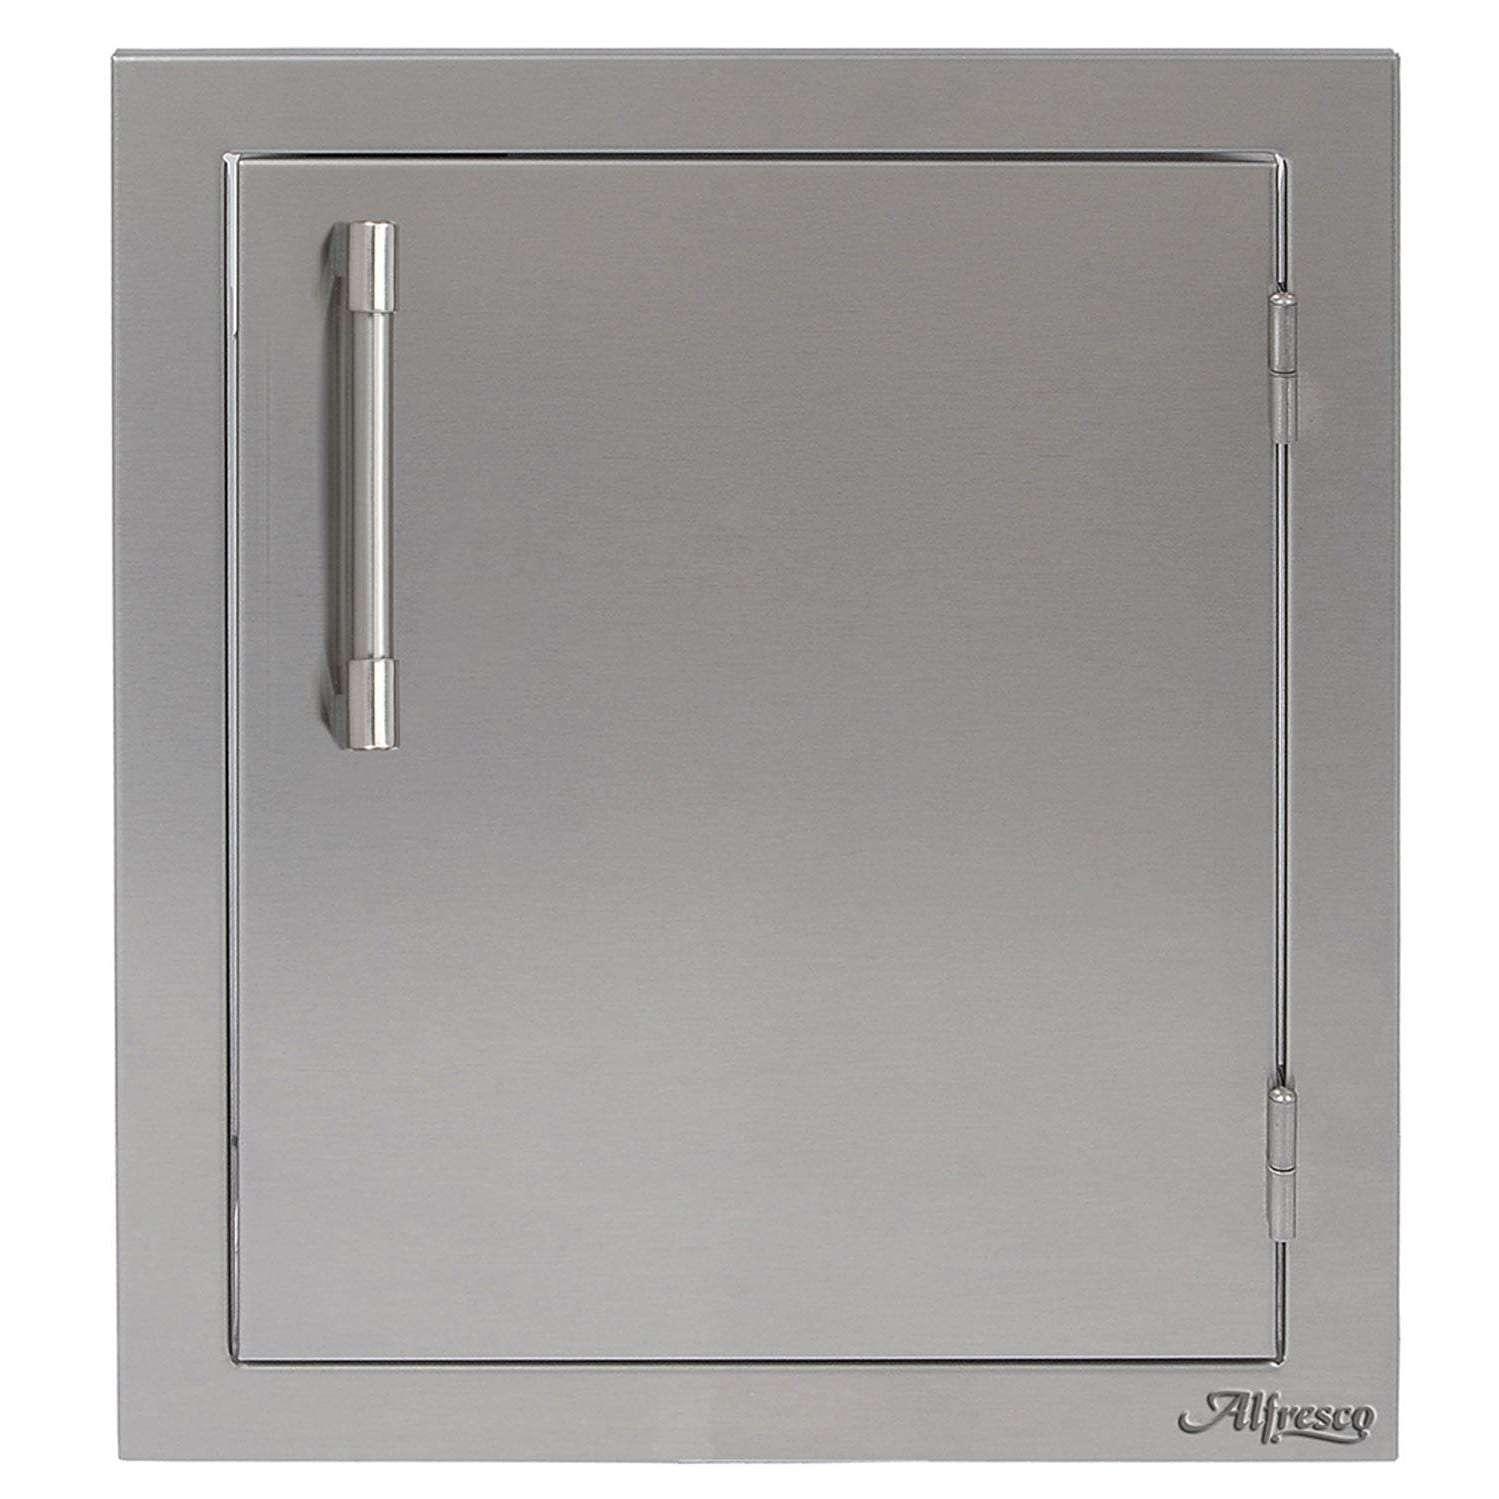 Alfresco 17-Inch Right-Hinged Vertical Single Access Door